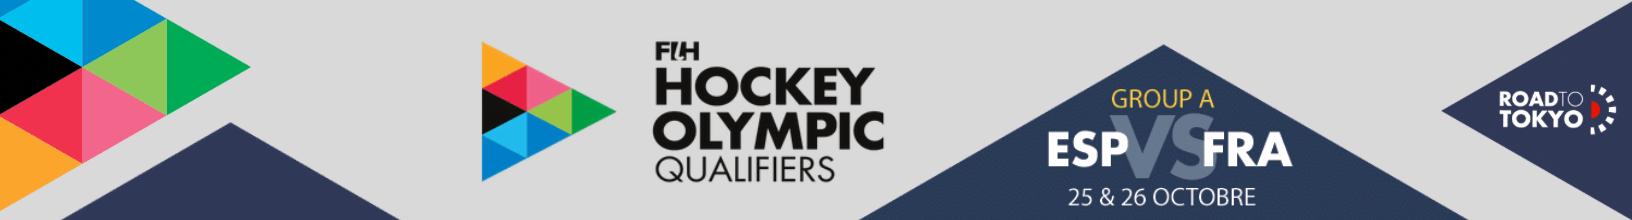 FIH Hockey Olympic Qualifiers